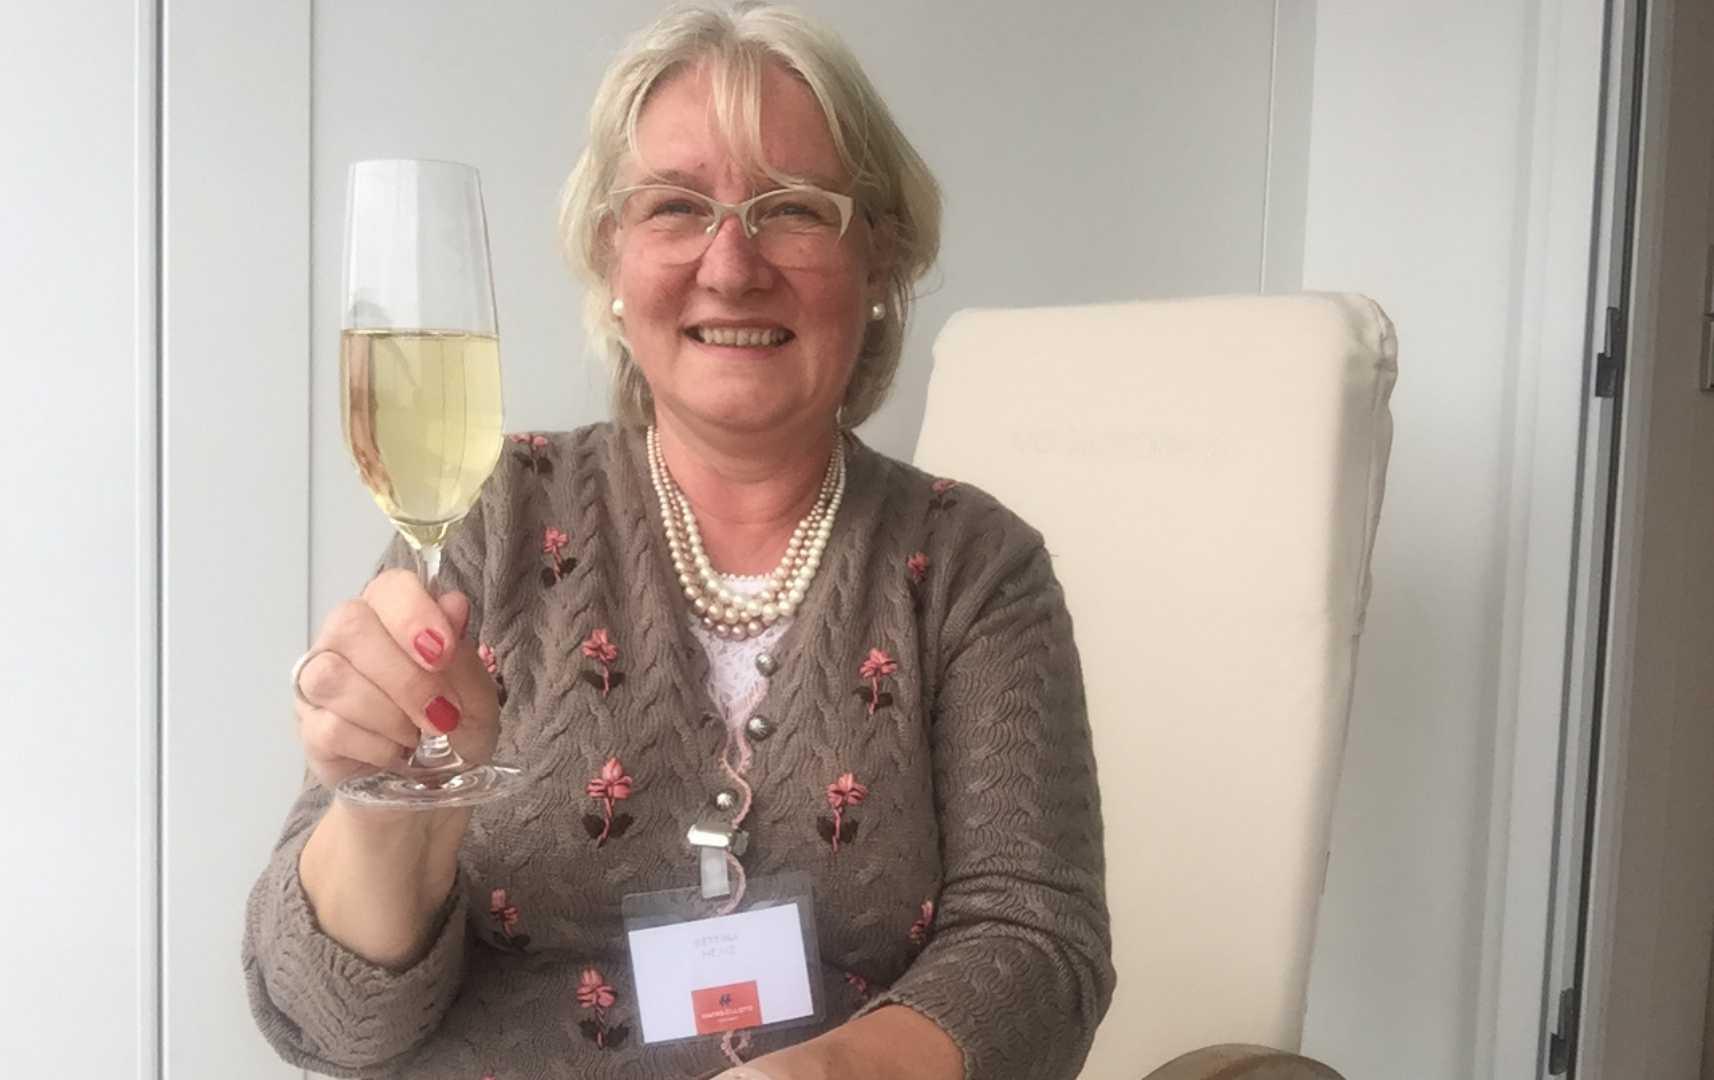 Bettina Heinz auf dem Balkon - MS Europa 2